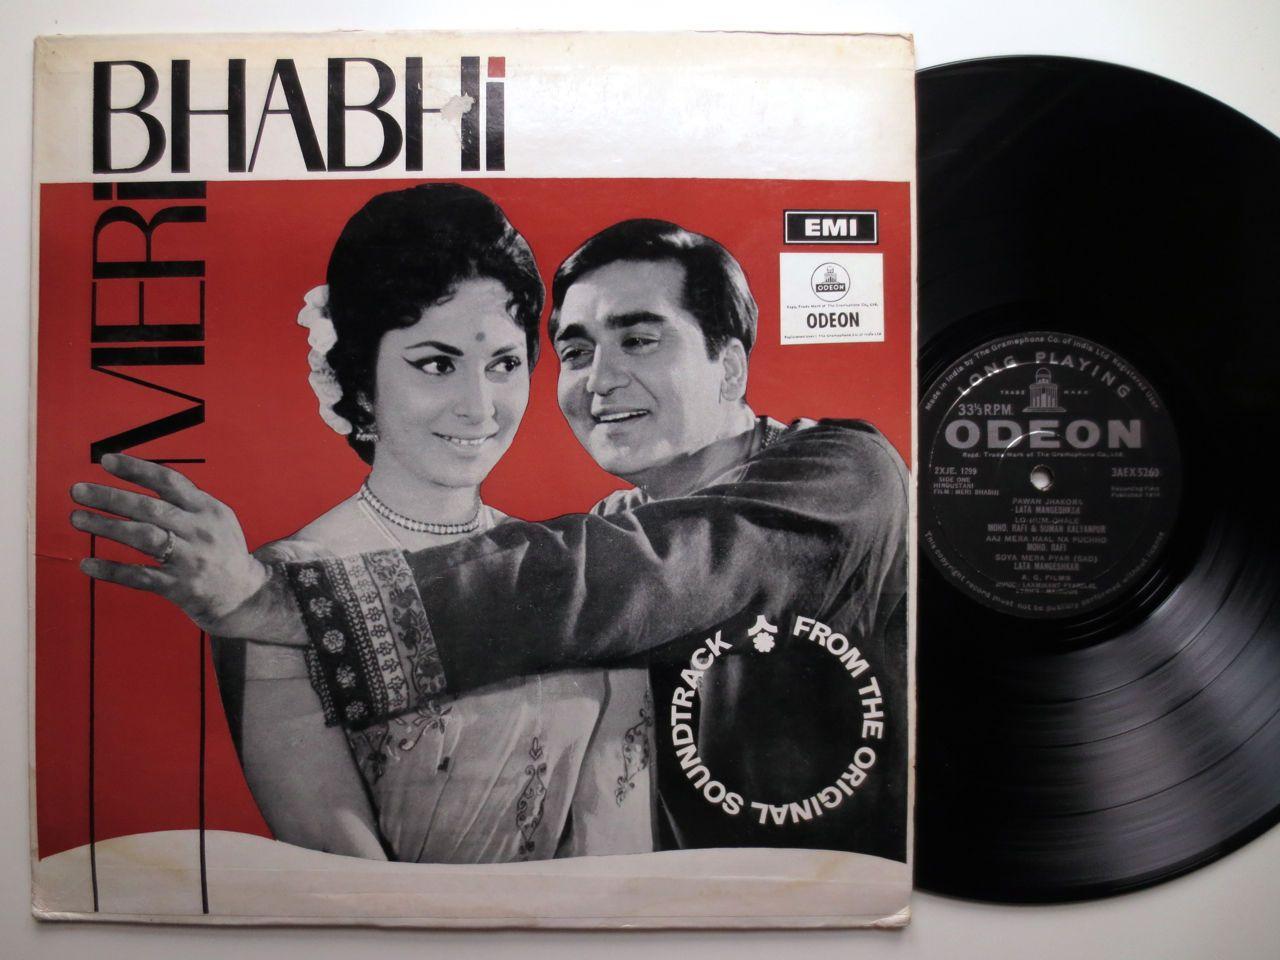 MERI BHABHI soundtrack - rare INDIA ODEON bollywood LATA MANGESHKAR OST https://t.co/dmywjsojgw https://t.co/eb32dyHaYs